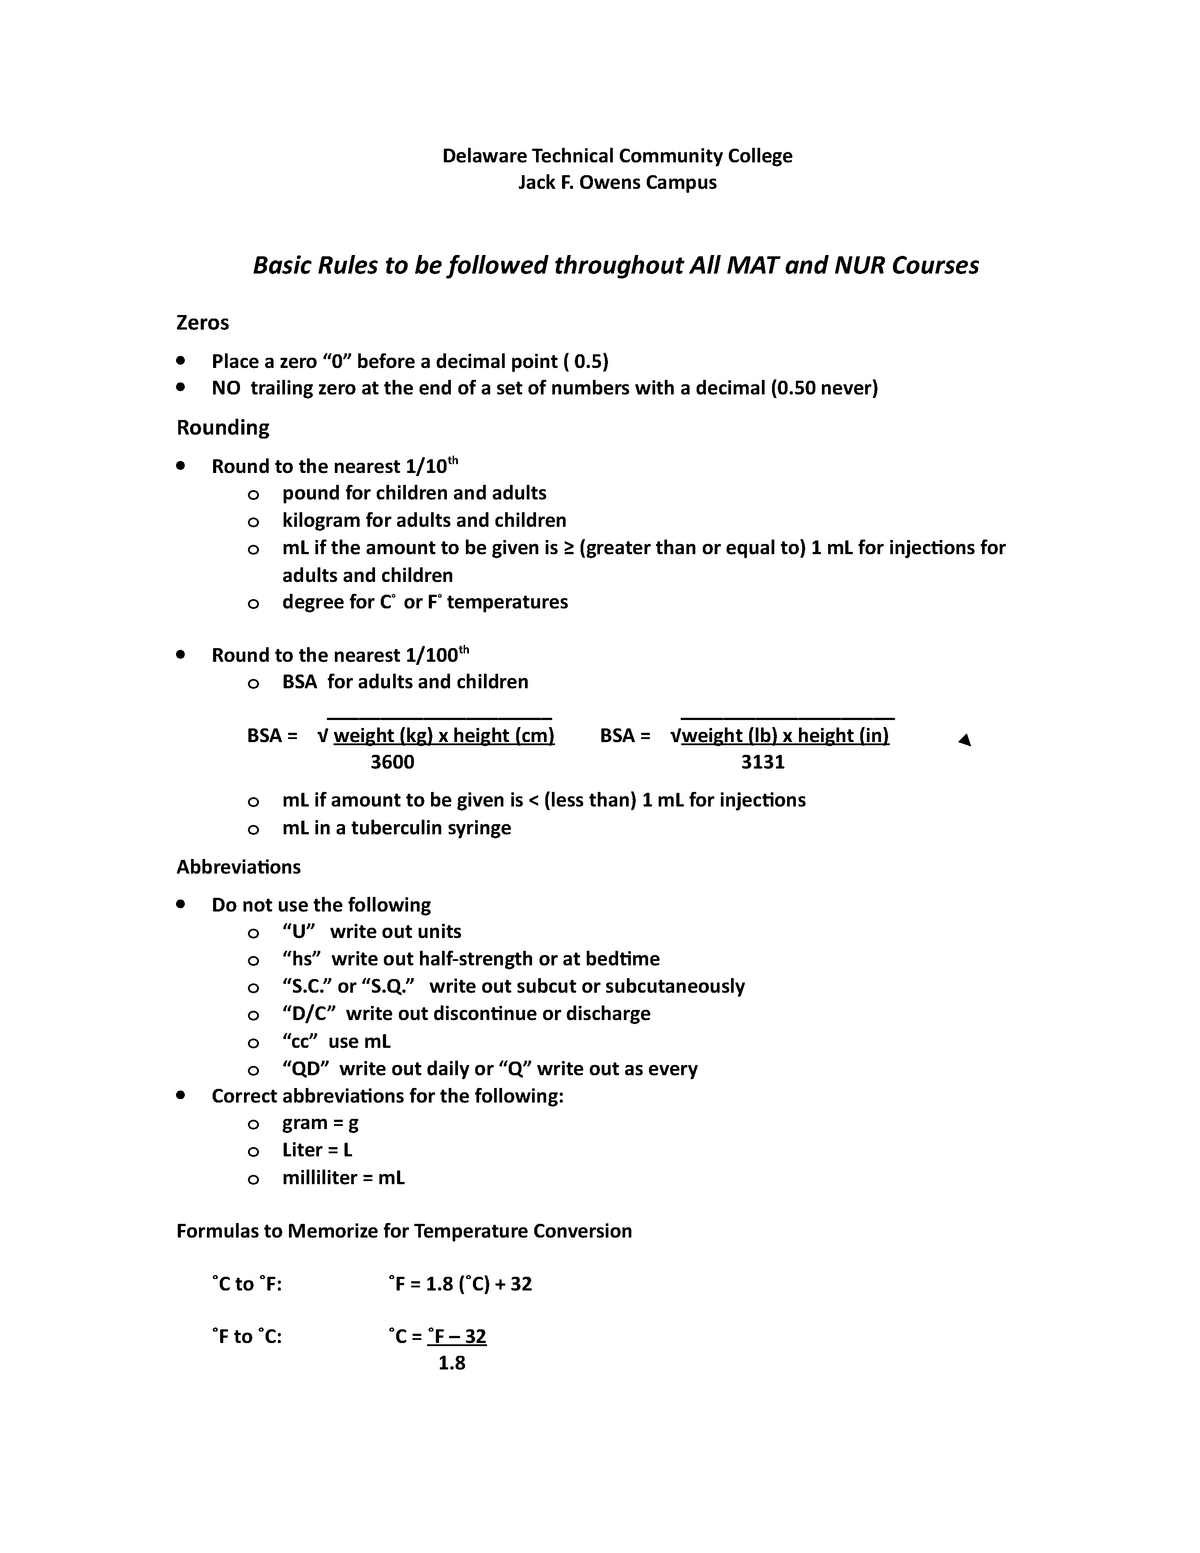 Math Rules for Nursing - - StuDocu